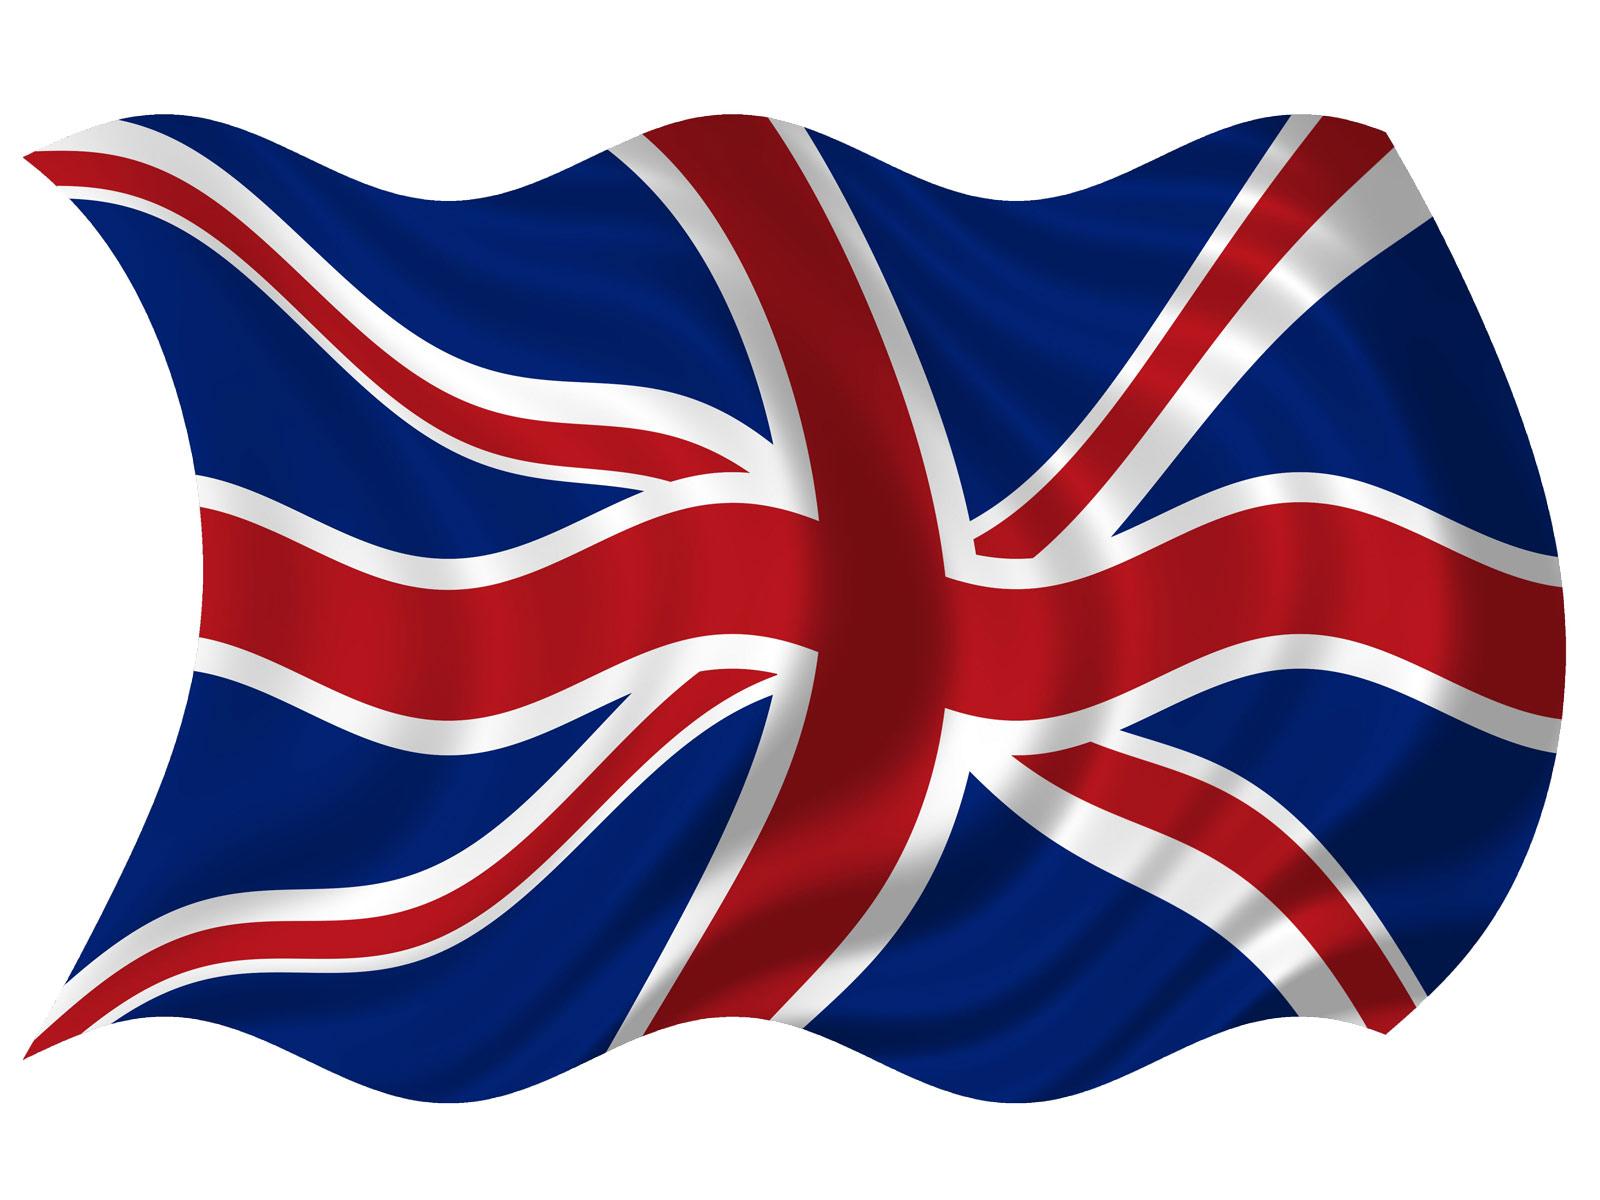 Free UK Flag Cliparts, Download Free Clip Art, Free Clip Art.